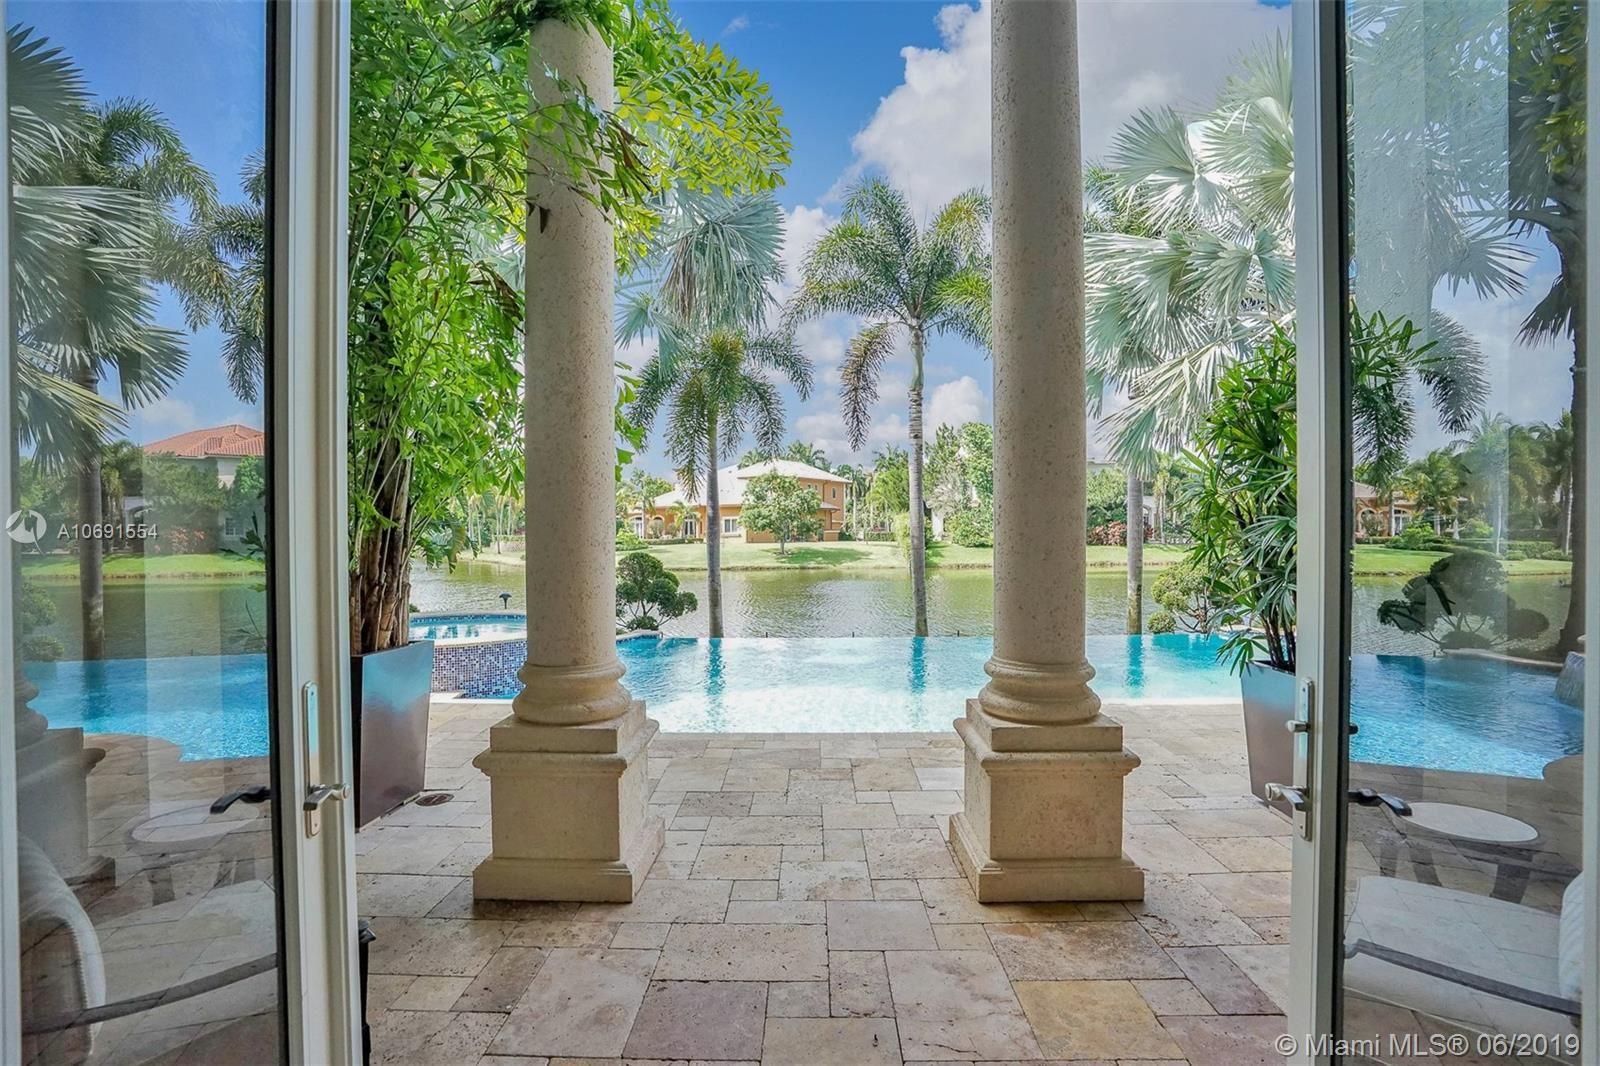 436 Sweet Bay Ave, Plantation, FL 33324 - MLS#: A10691554